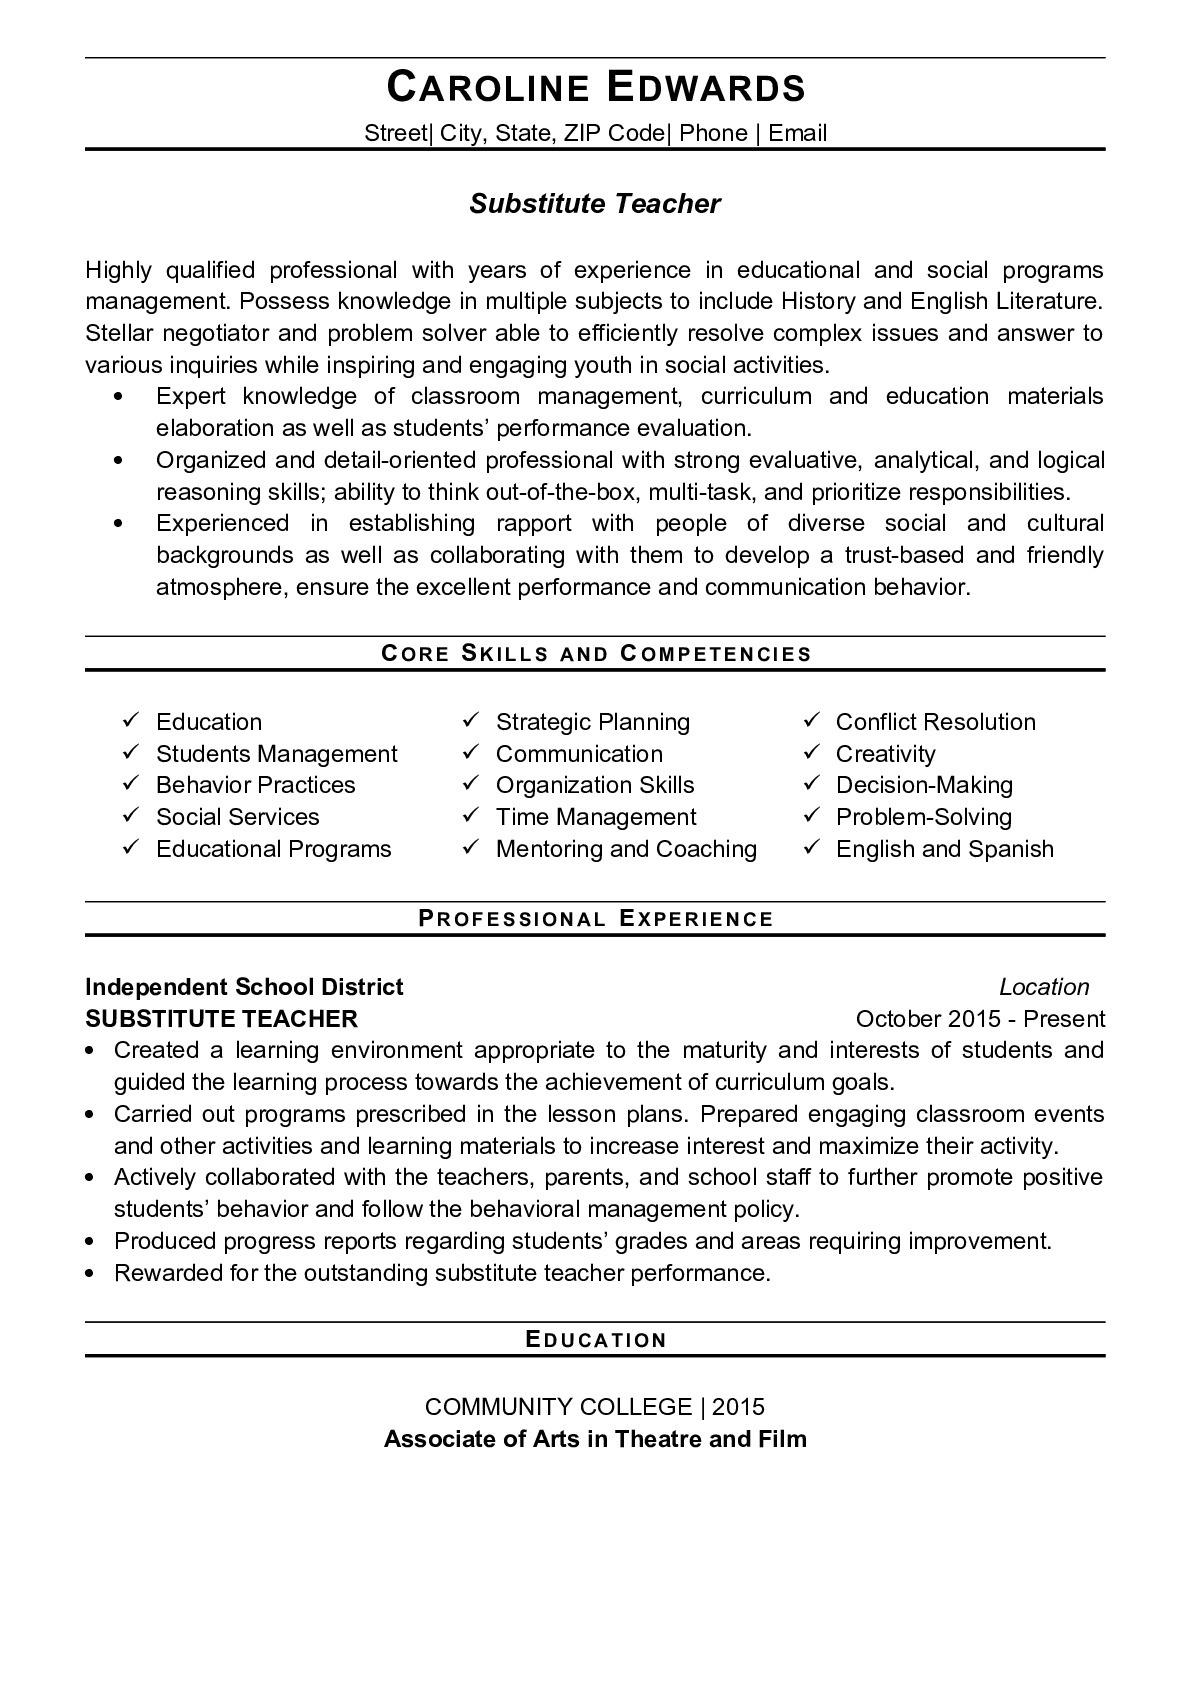 Resume Example for Substitute Teacher